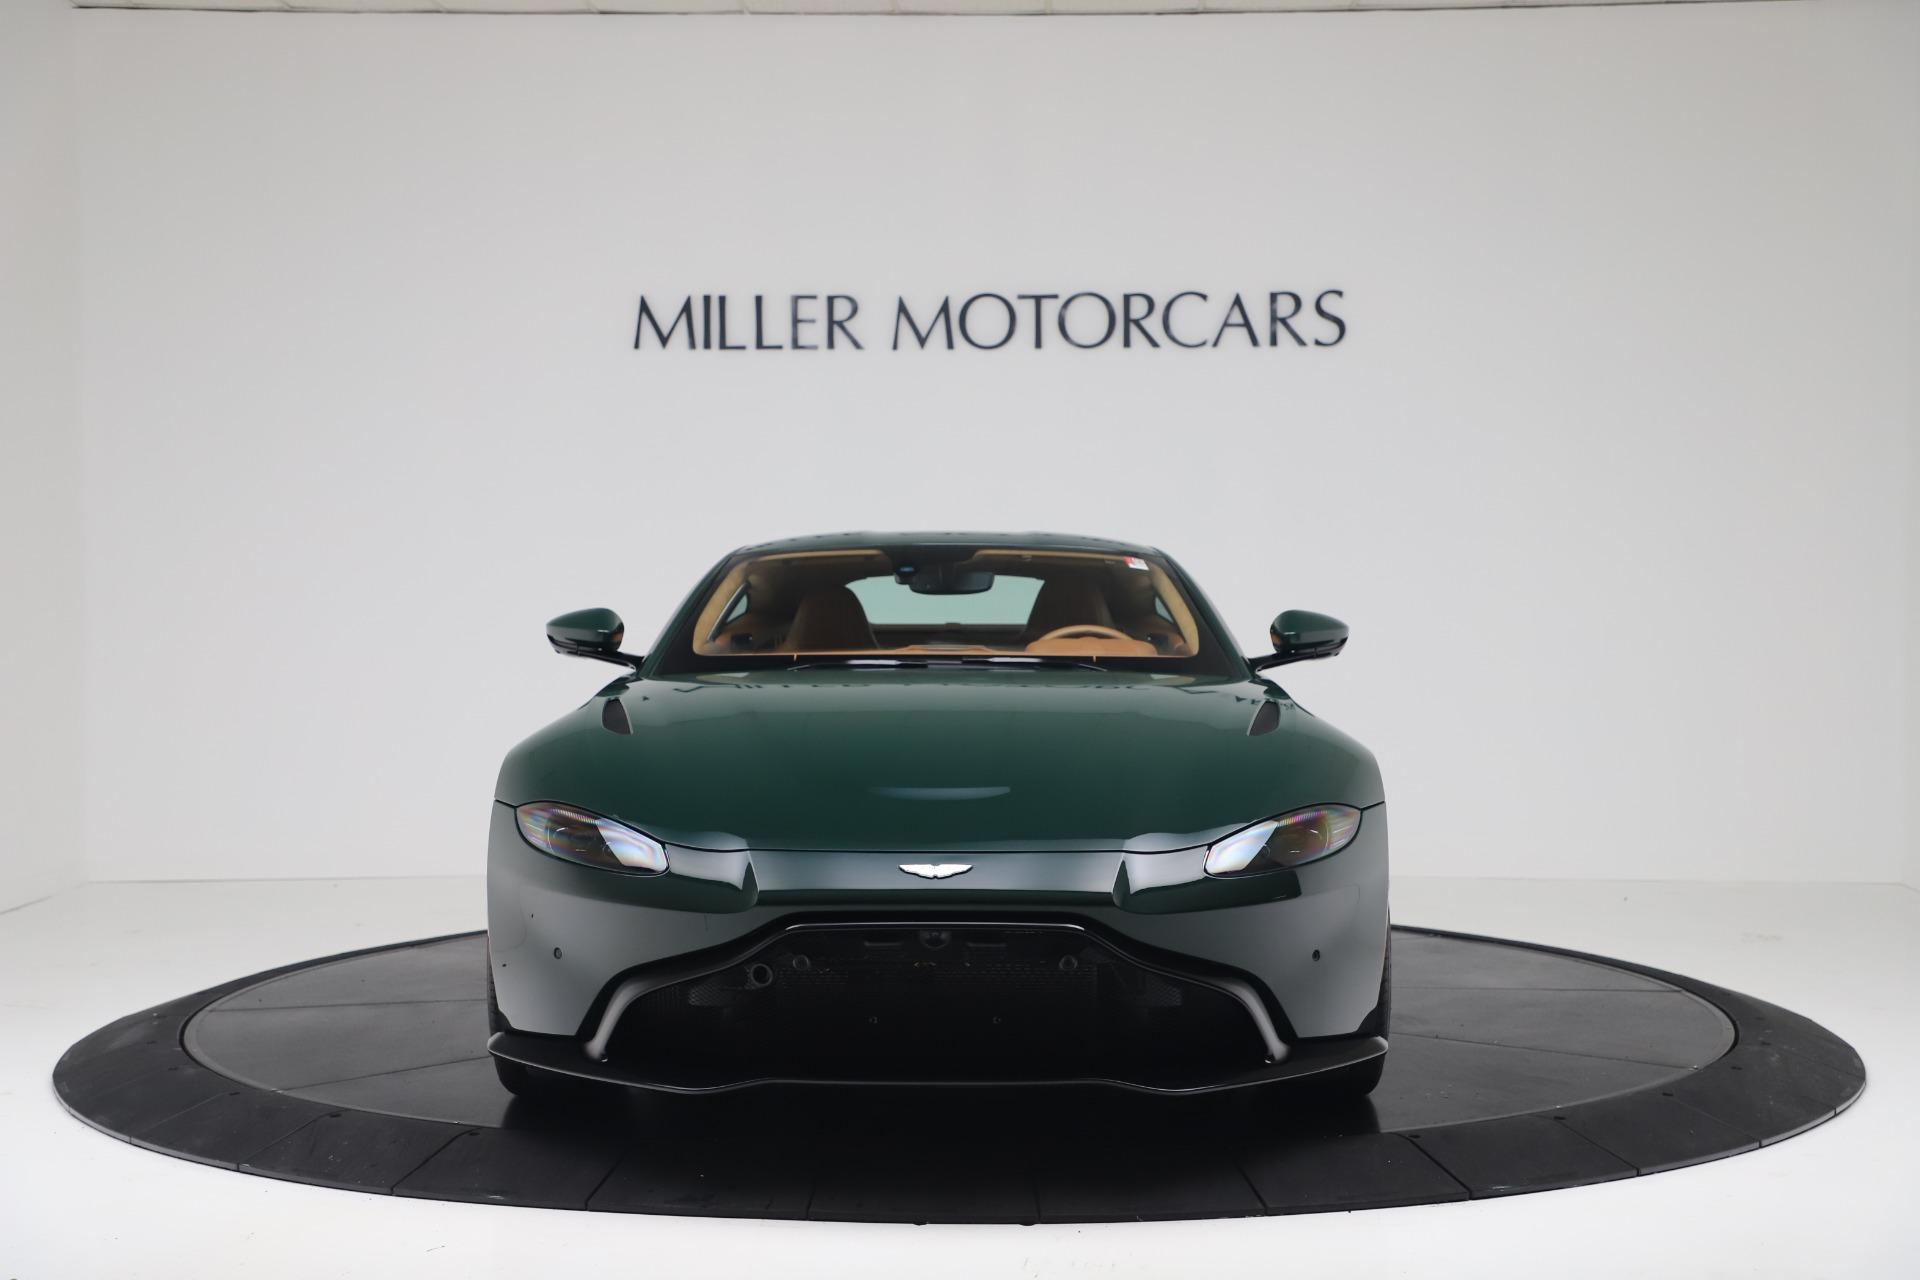 New 2020 Aston Martin Vantage  For Sale In Westport, CT 3411_p2